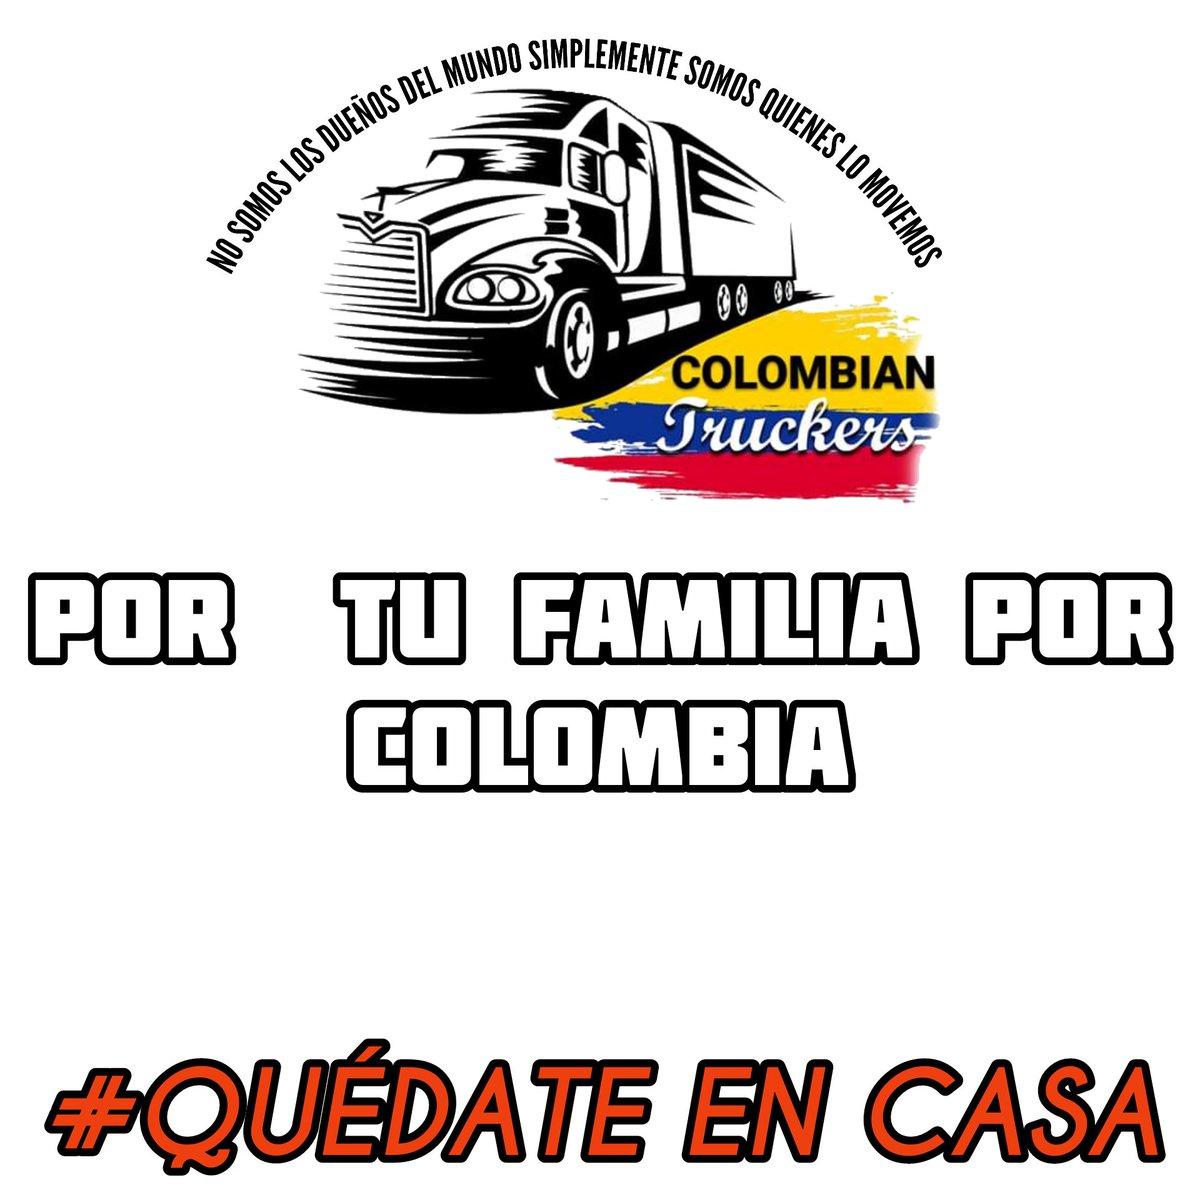 colombian truckers on twitter quedateencasaeh1 colombian truckers bigrig colombia freightliner brasil paraguay honduras kemworth fuso dodge chevrolet peru guatemala internacional mack transportadores transporte ford lasp twitter